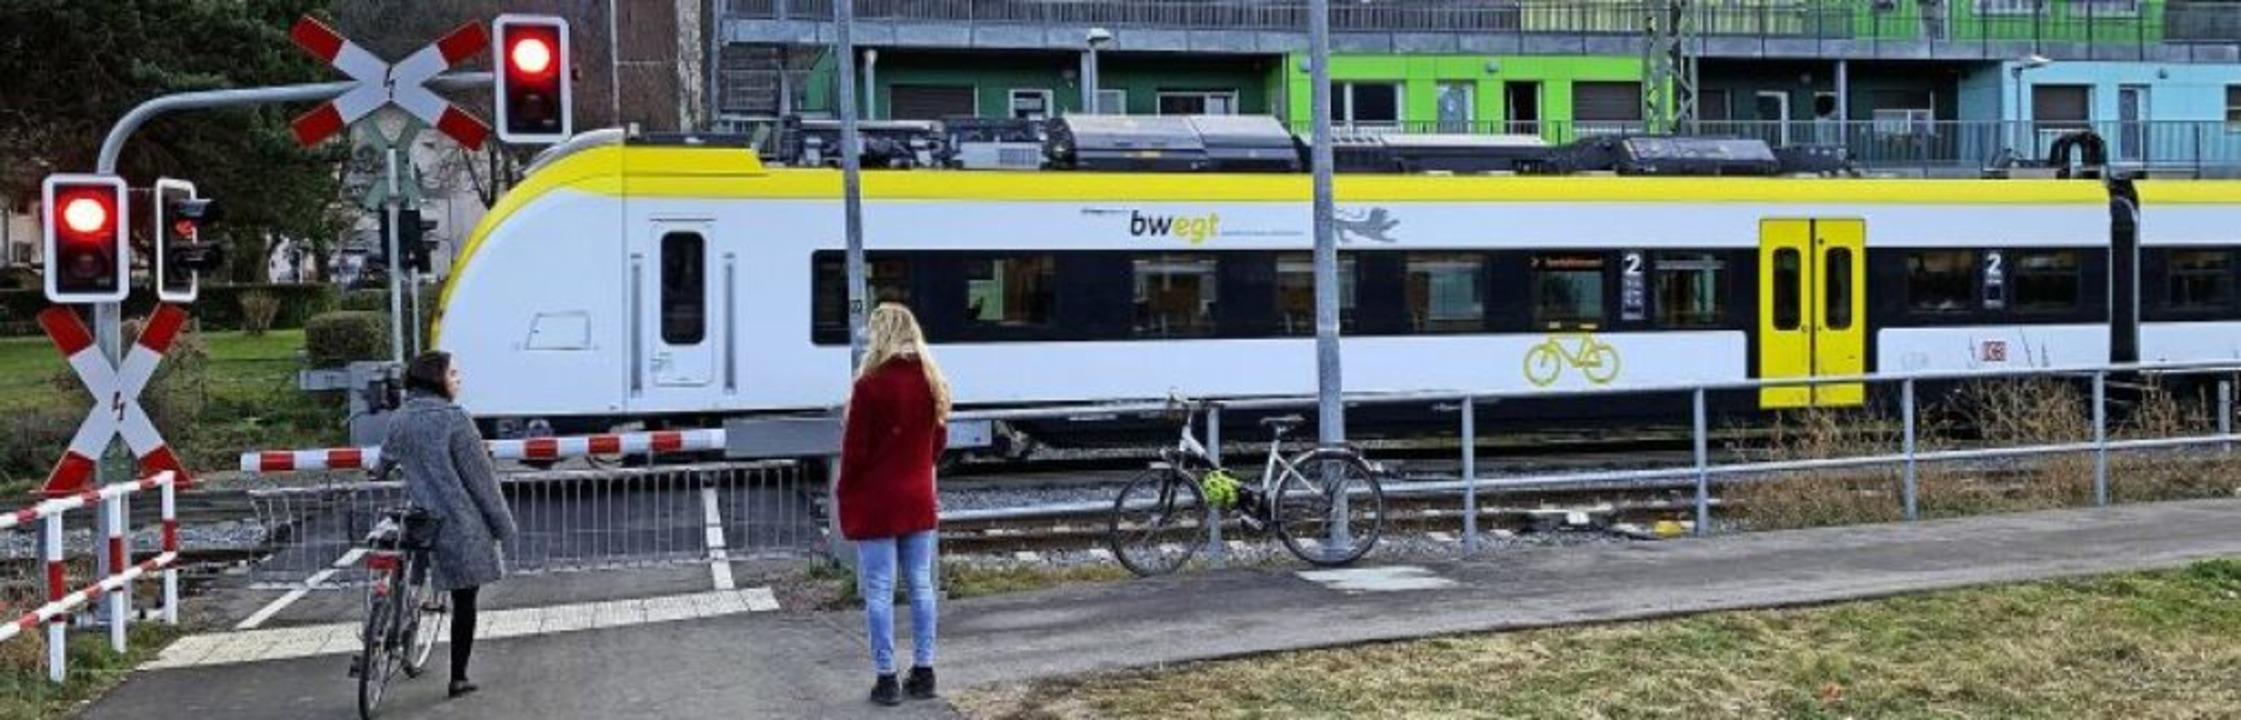 Eine S-Bahn am Bahnhof Littenweiler   | Foto: Peter Sliwka